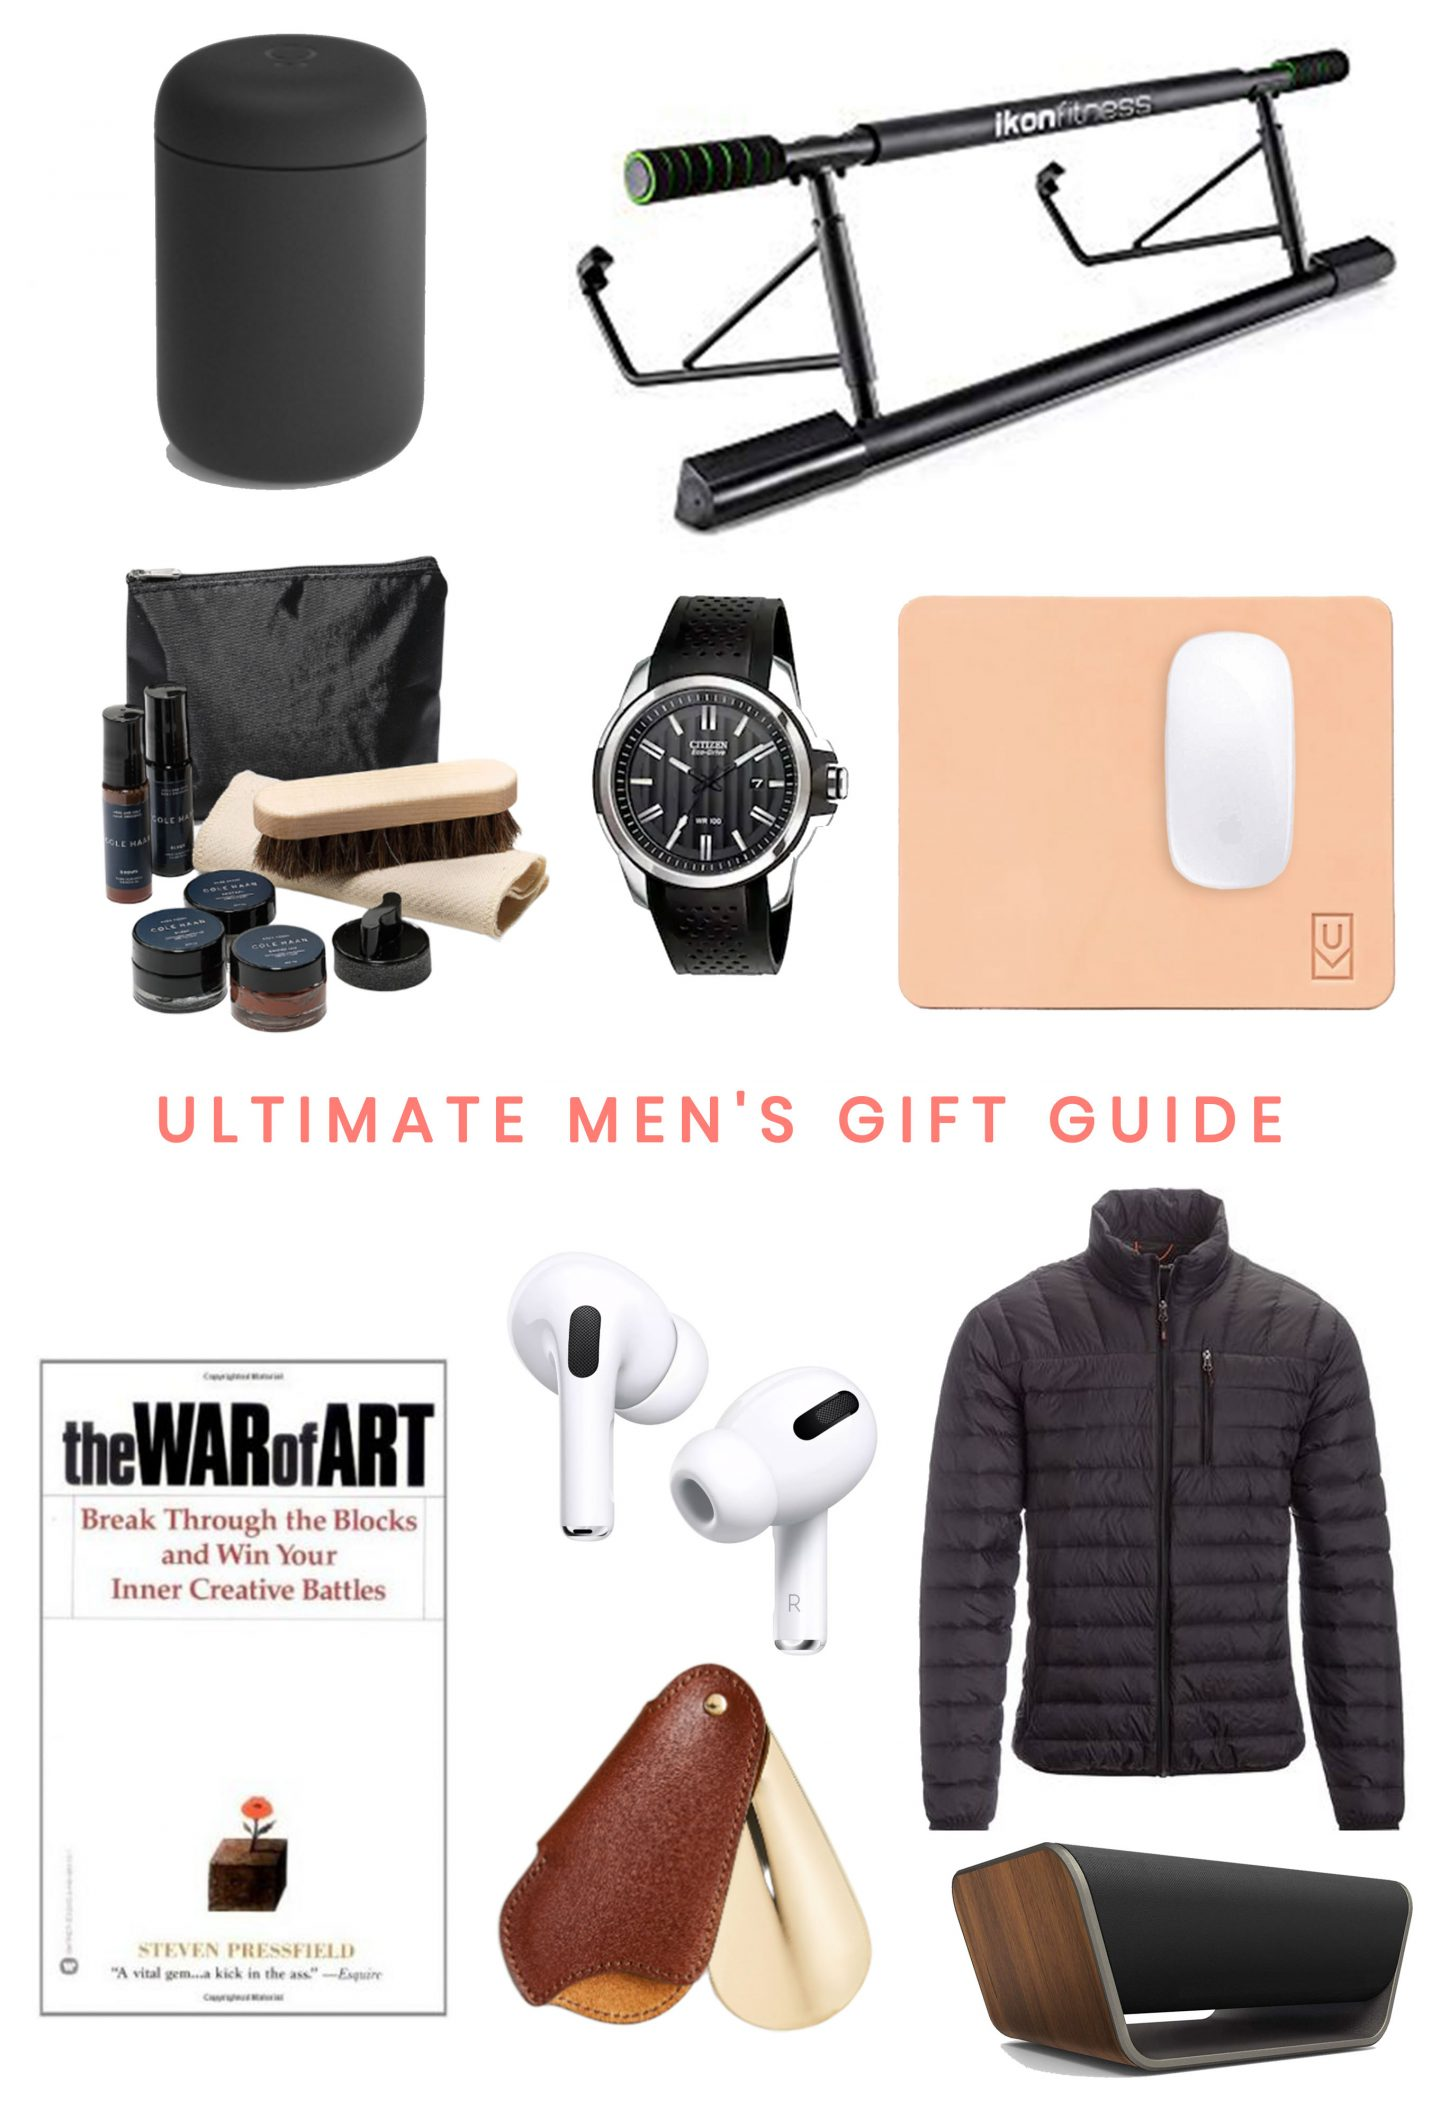 Ultimate Men's Gift Guide 2019